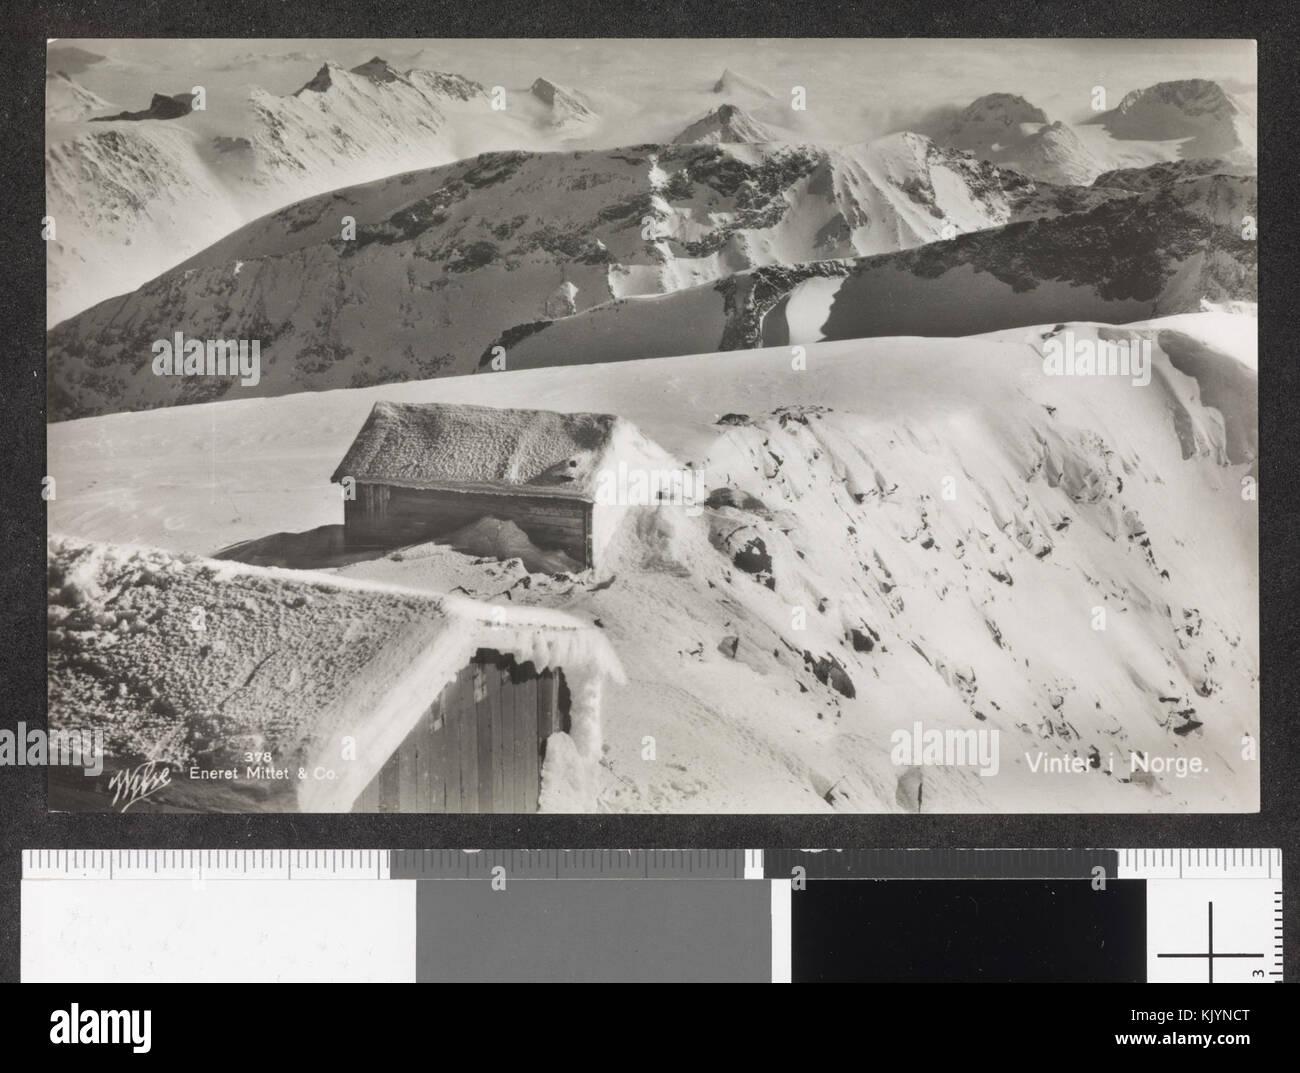 378. Vinter i Norge   no nb digifoto 20150116 00196 blds 07184 - Stock Image